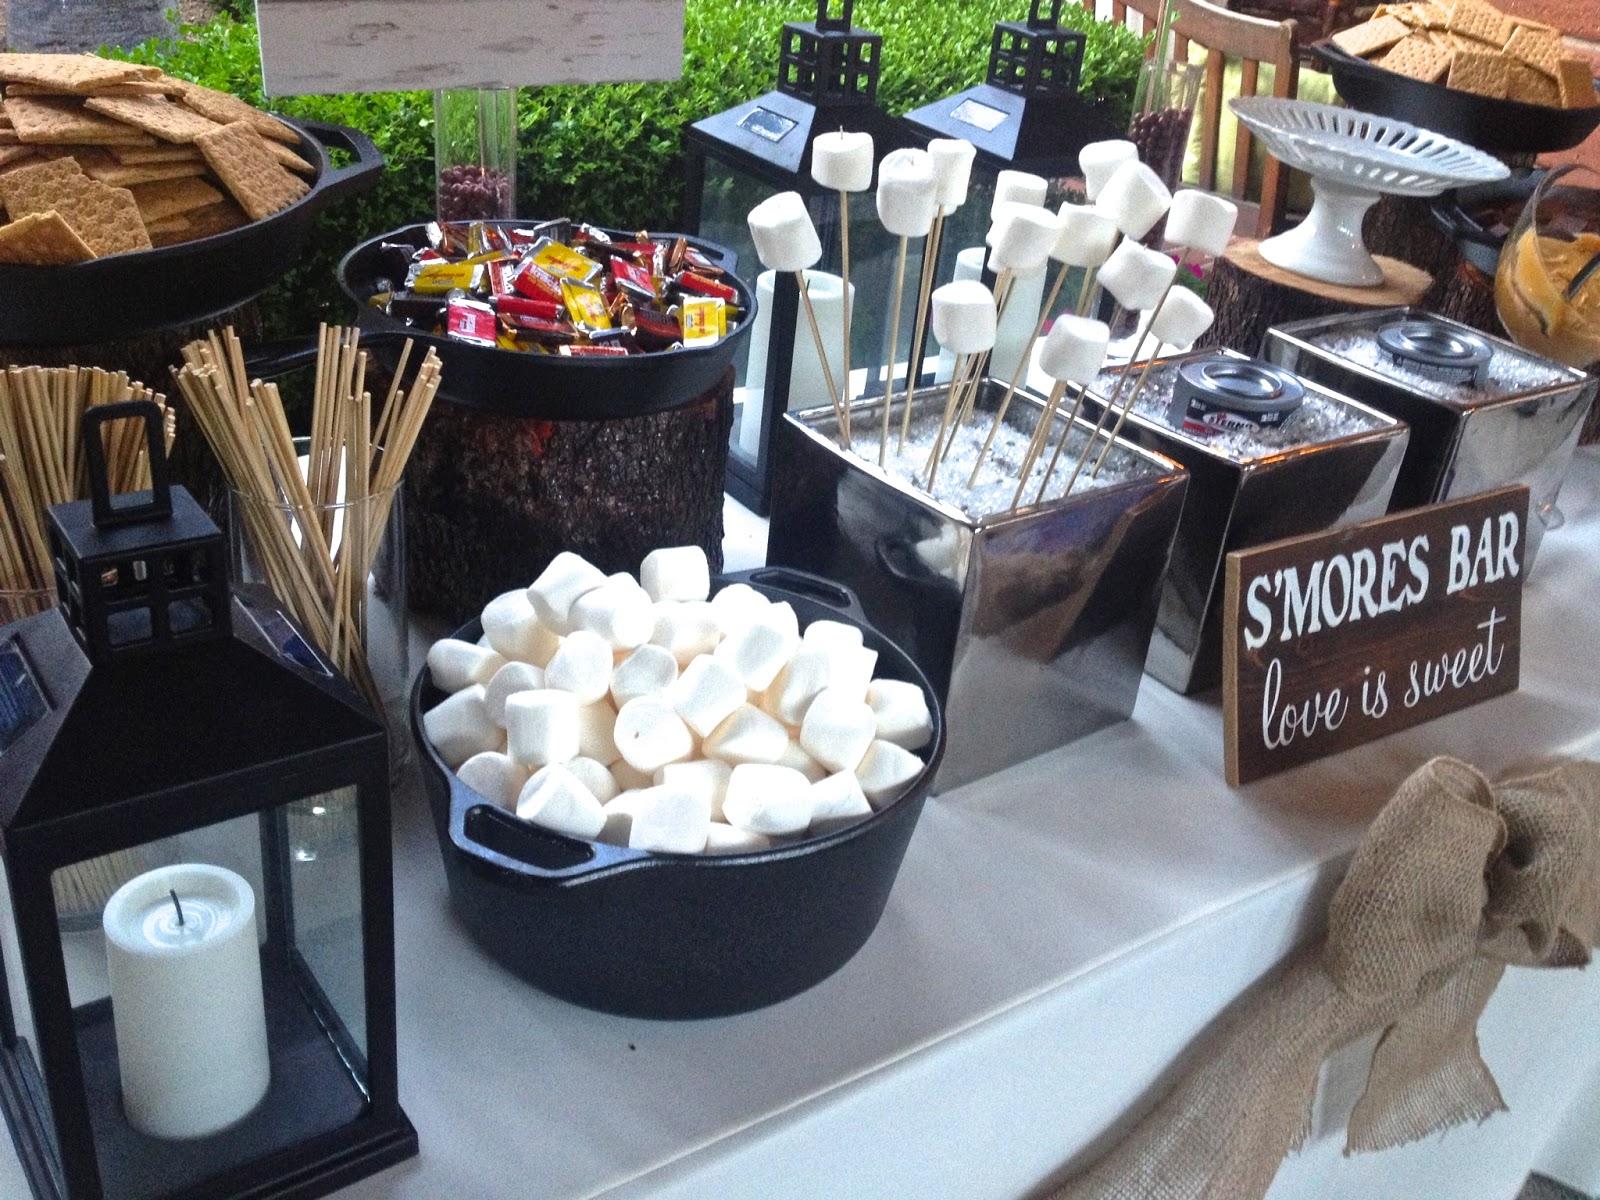 A Rustic Laguna Beach Wedding S'More Bar Station With